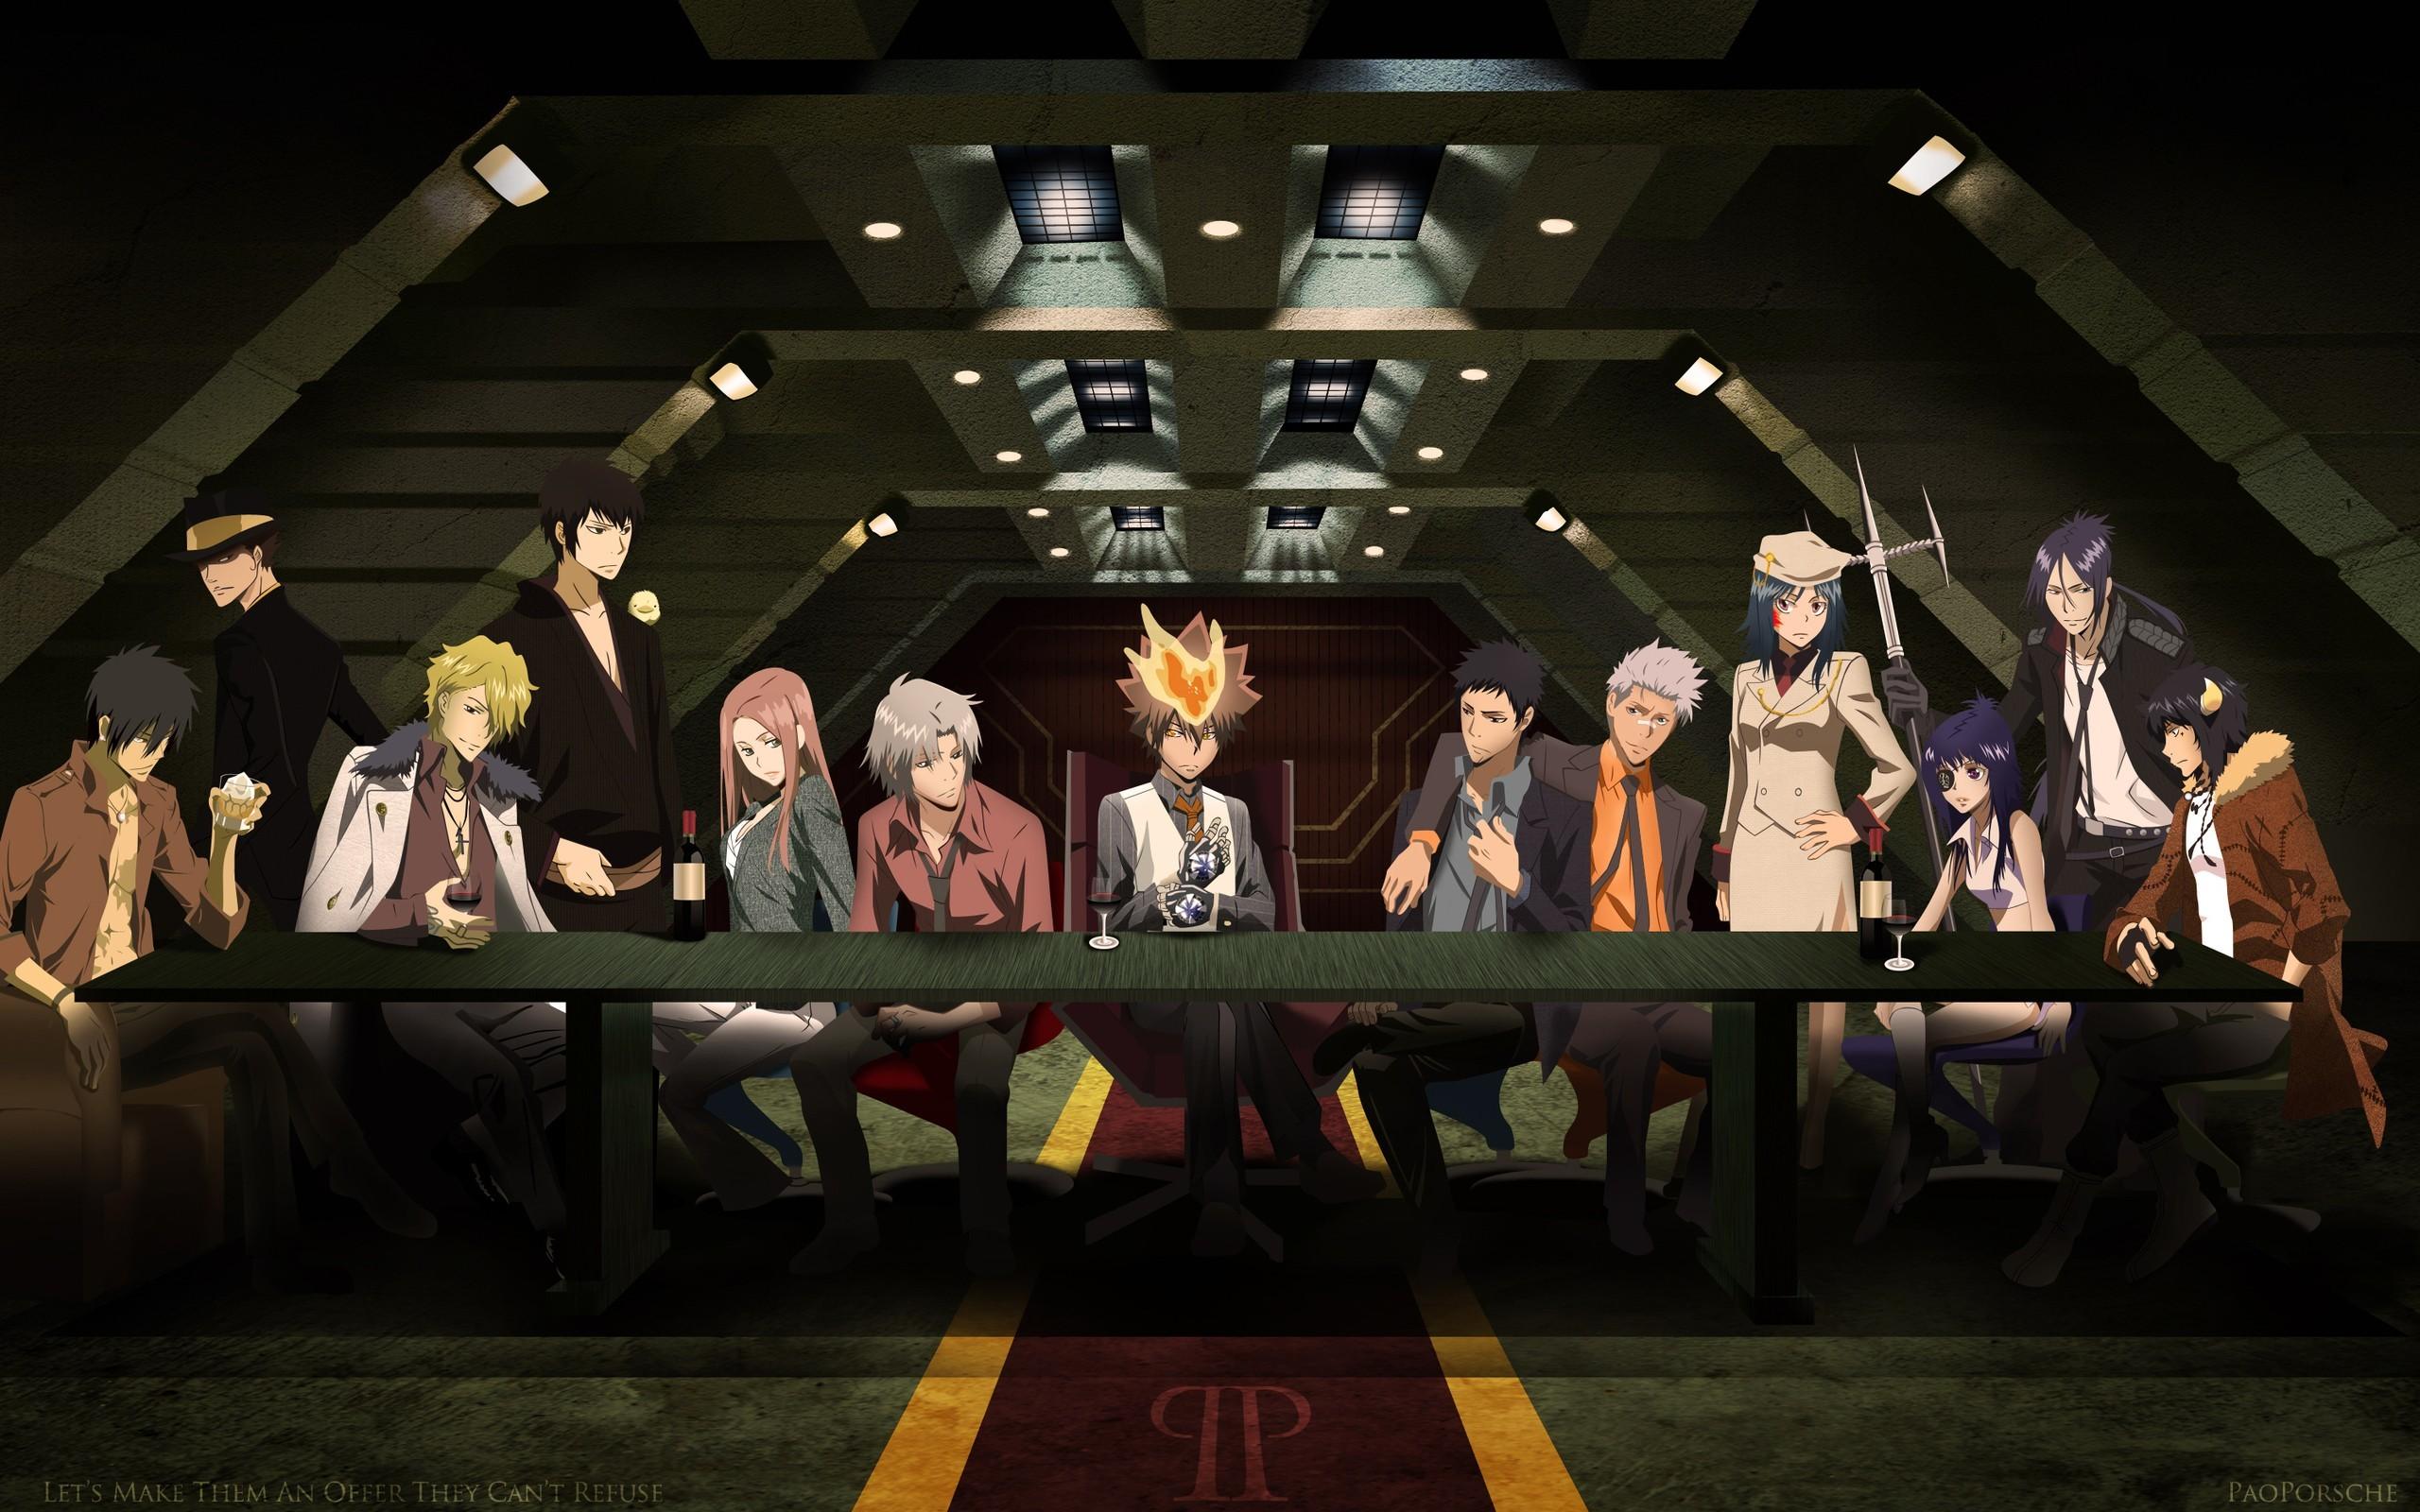 wallpaper Katekyo Hitman Reborn · The Last Supper